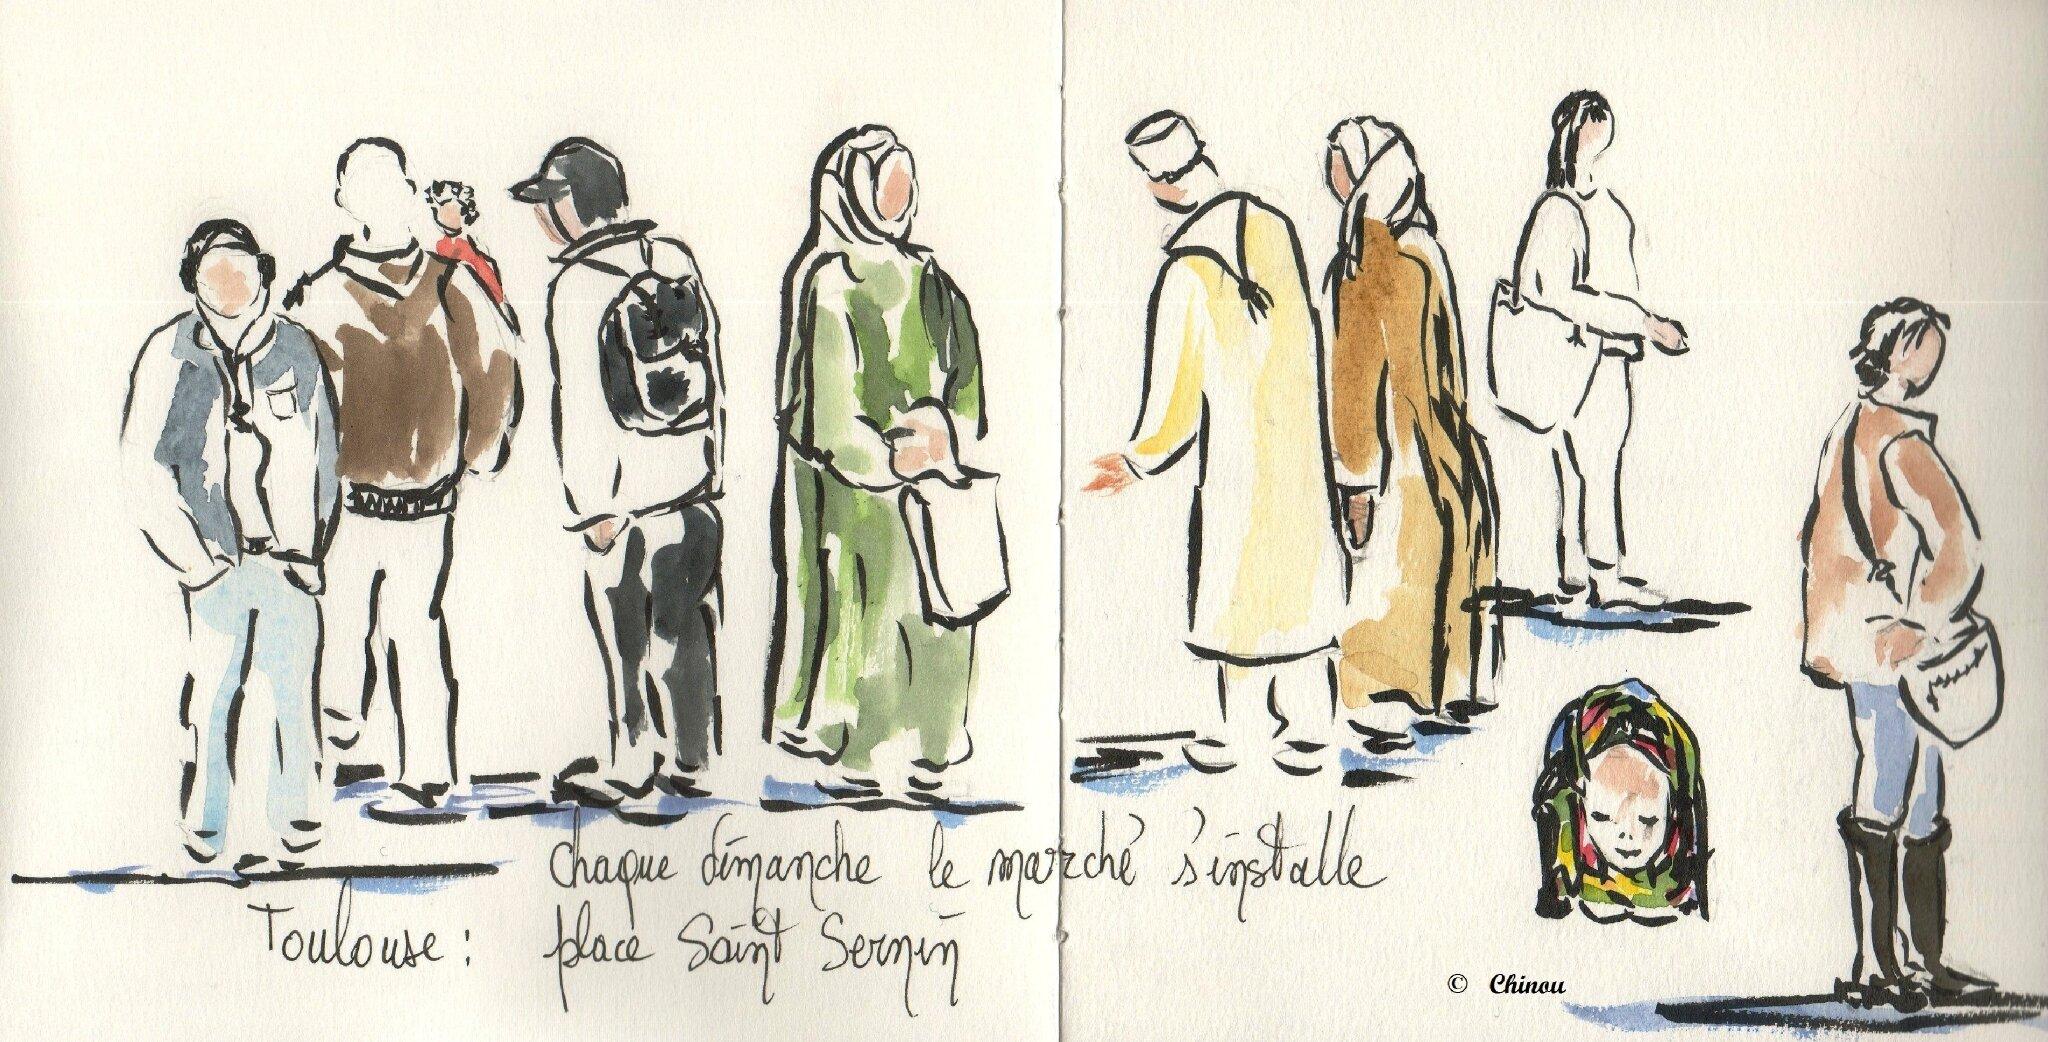 Marché Saint Sernin